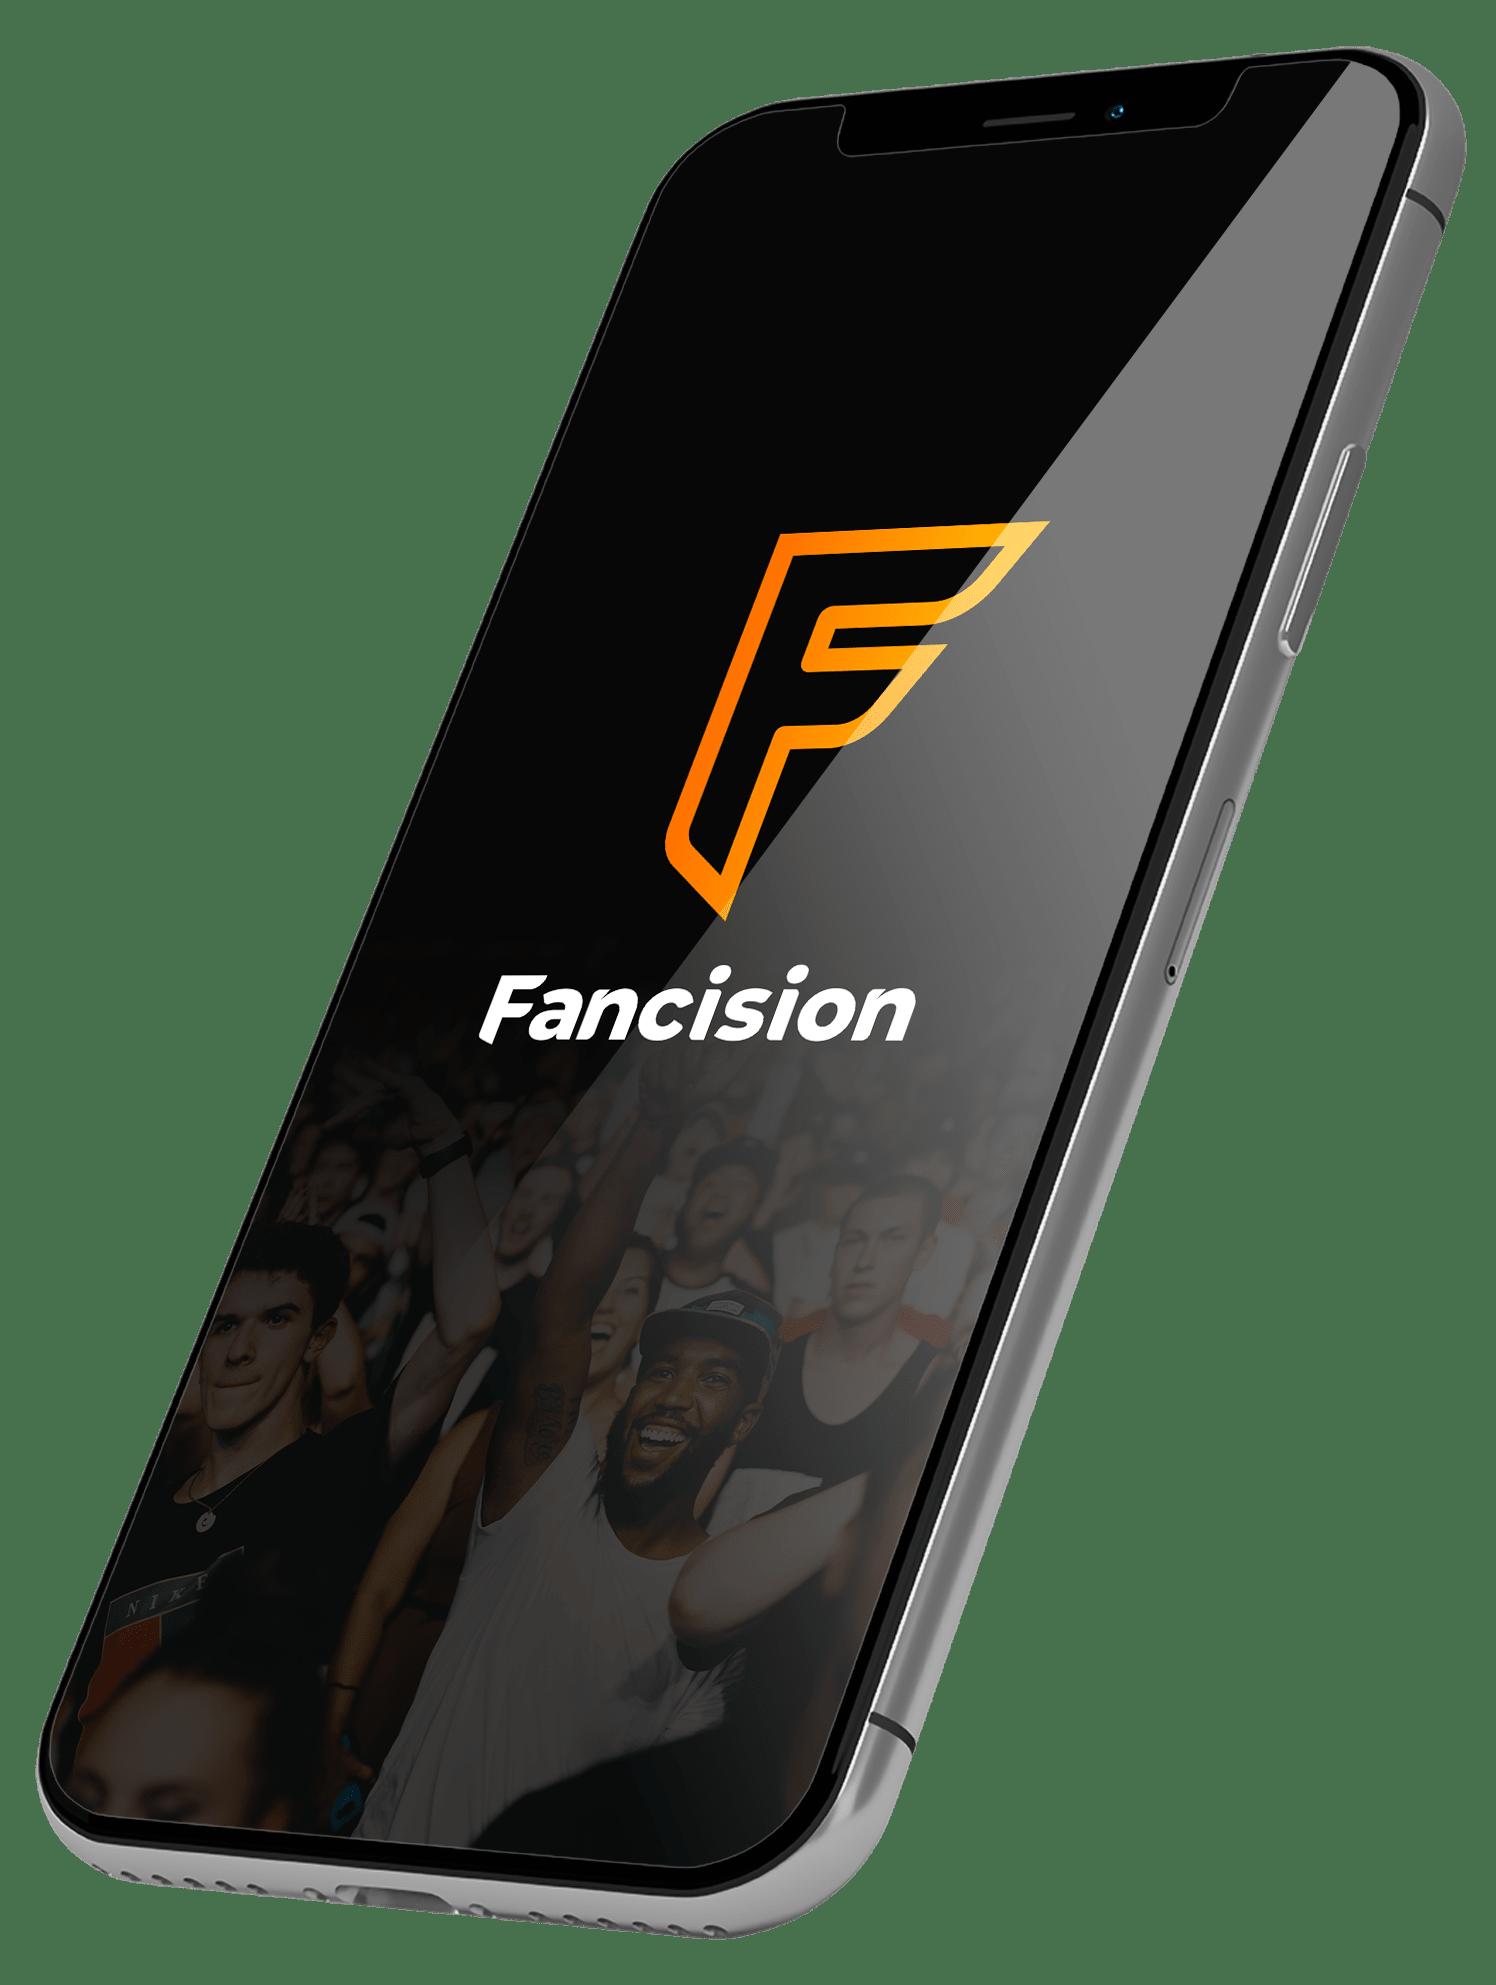 Fotografia Fancision - Pantalla de inicio